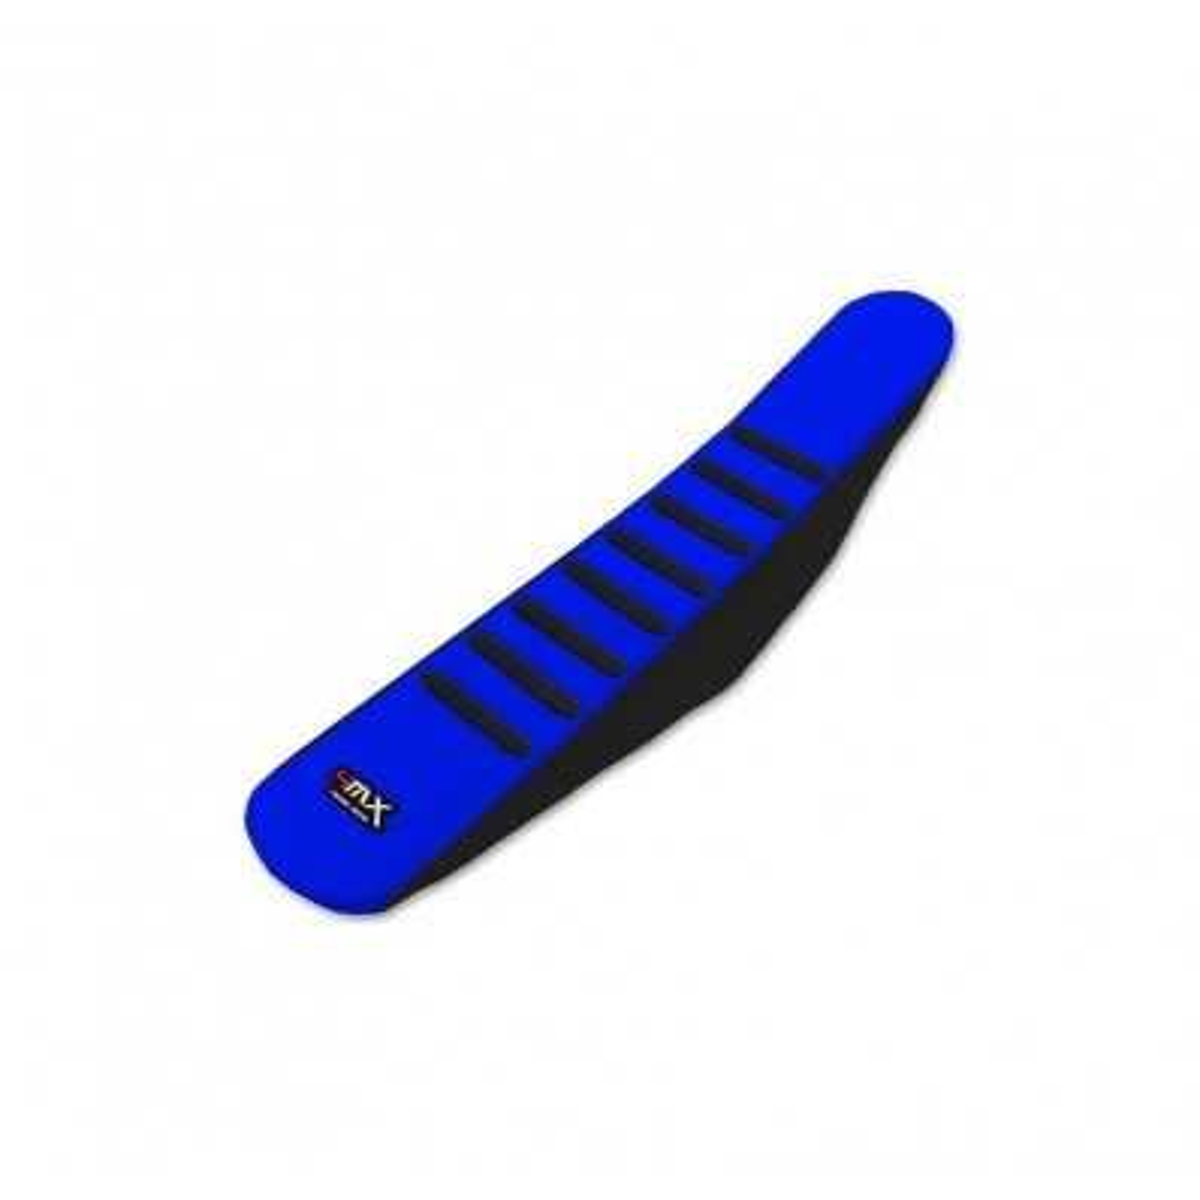 01CAP1022 - Funda Sillon 4Mx Yamaha Yzf 250 450 06 09´ Negro Azul